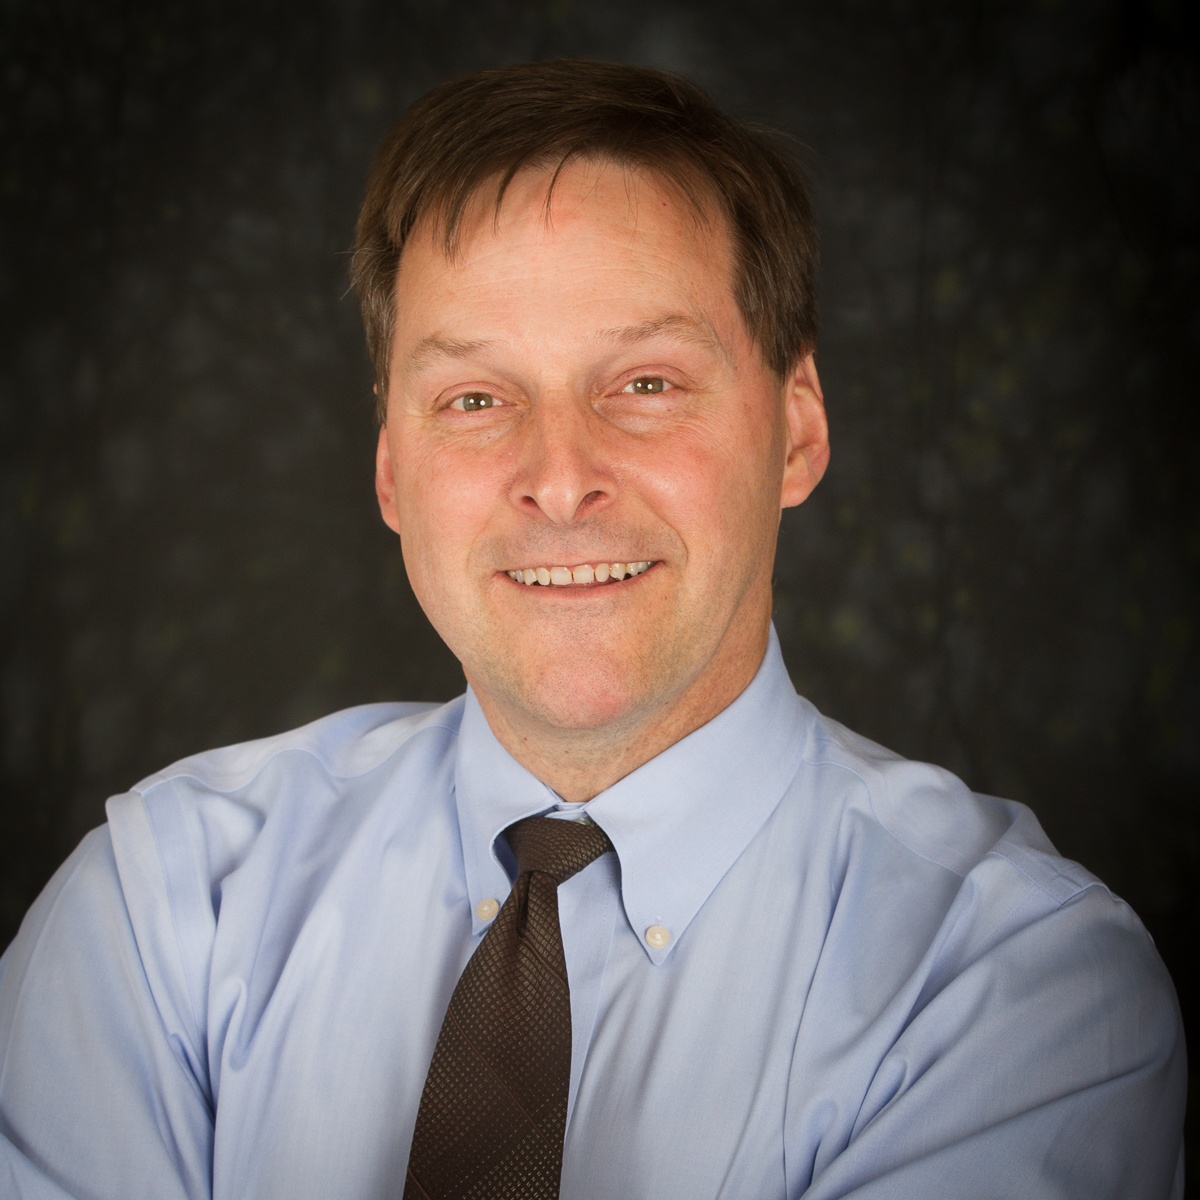 Kurt Niermann Workers' Compensation lawyer